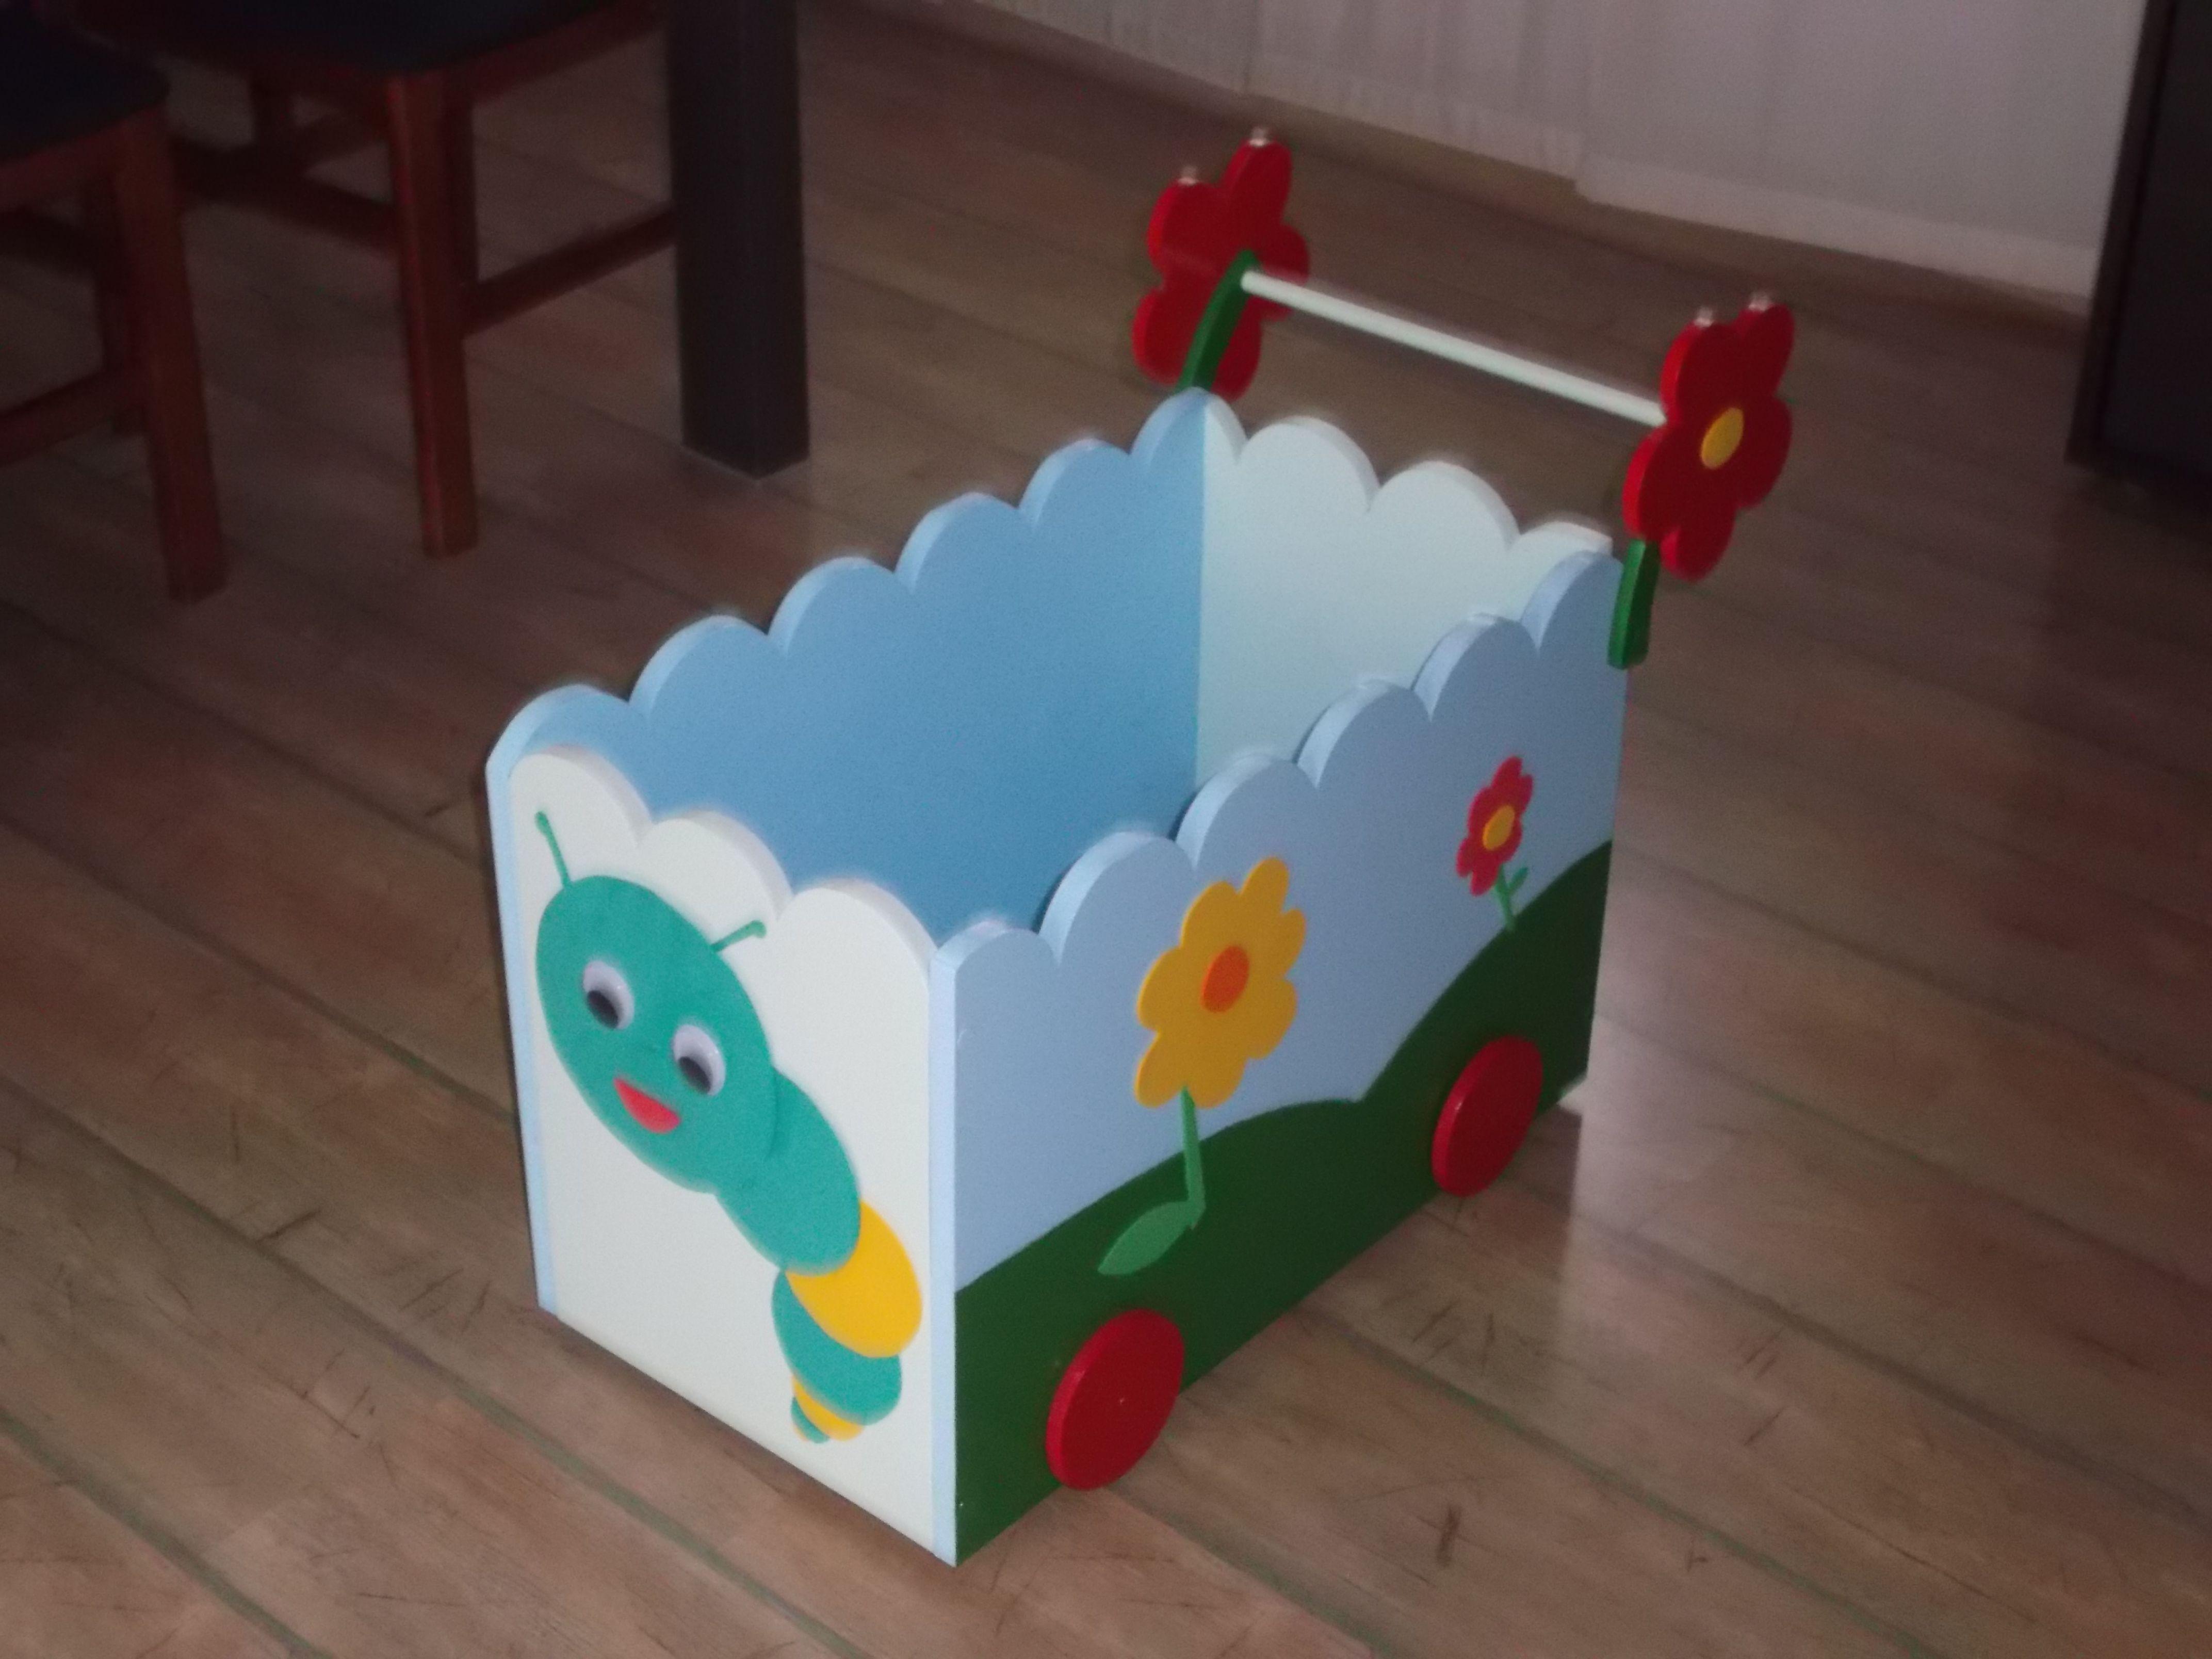 Carrito de madera con ruedas para juguetes decoraci n for Decoracion infantil goma eva